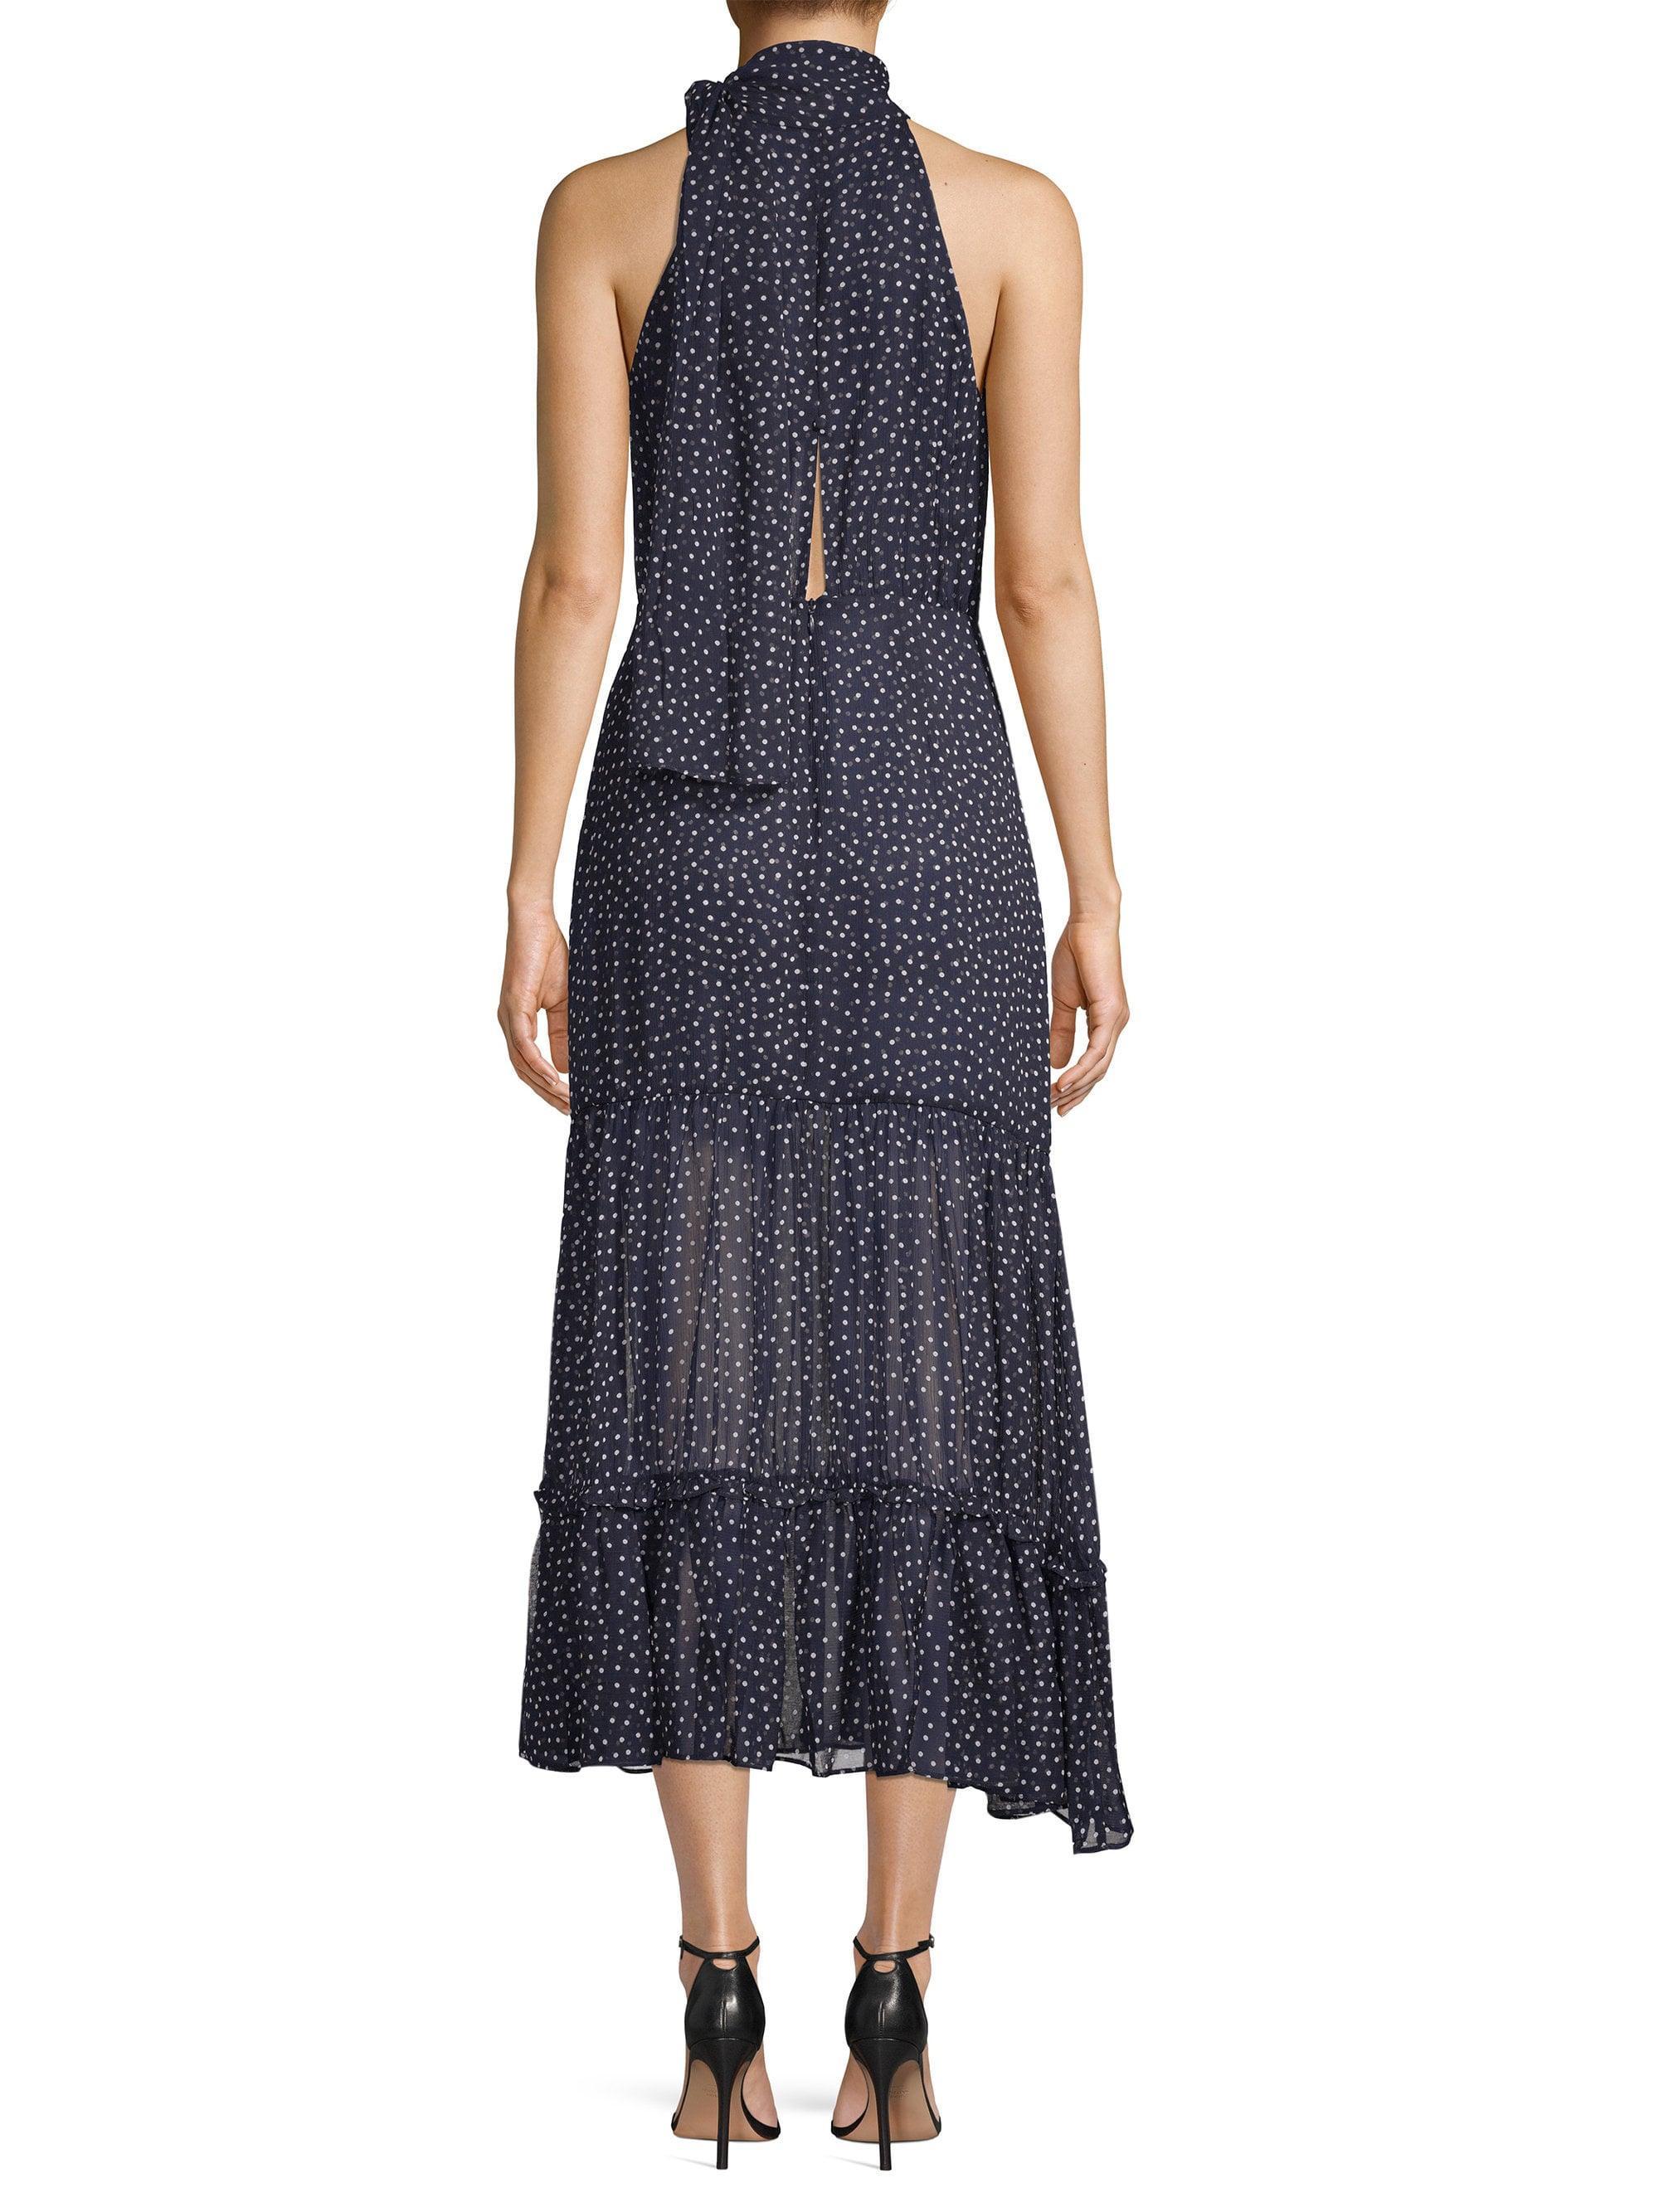 95ed22bbd77 Lyst - RIXO London Eleanor Tie-neck Polka Dot Silk A-line Midi Dress in Blue